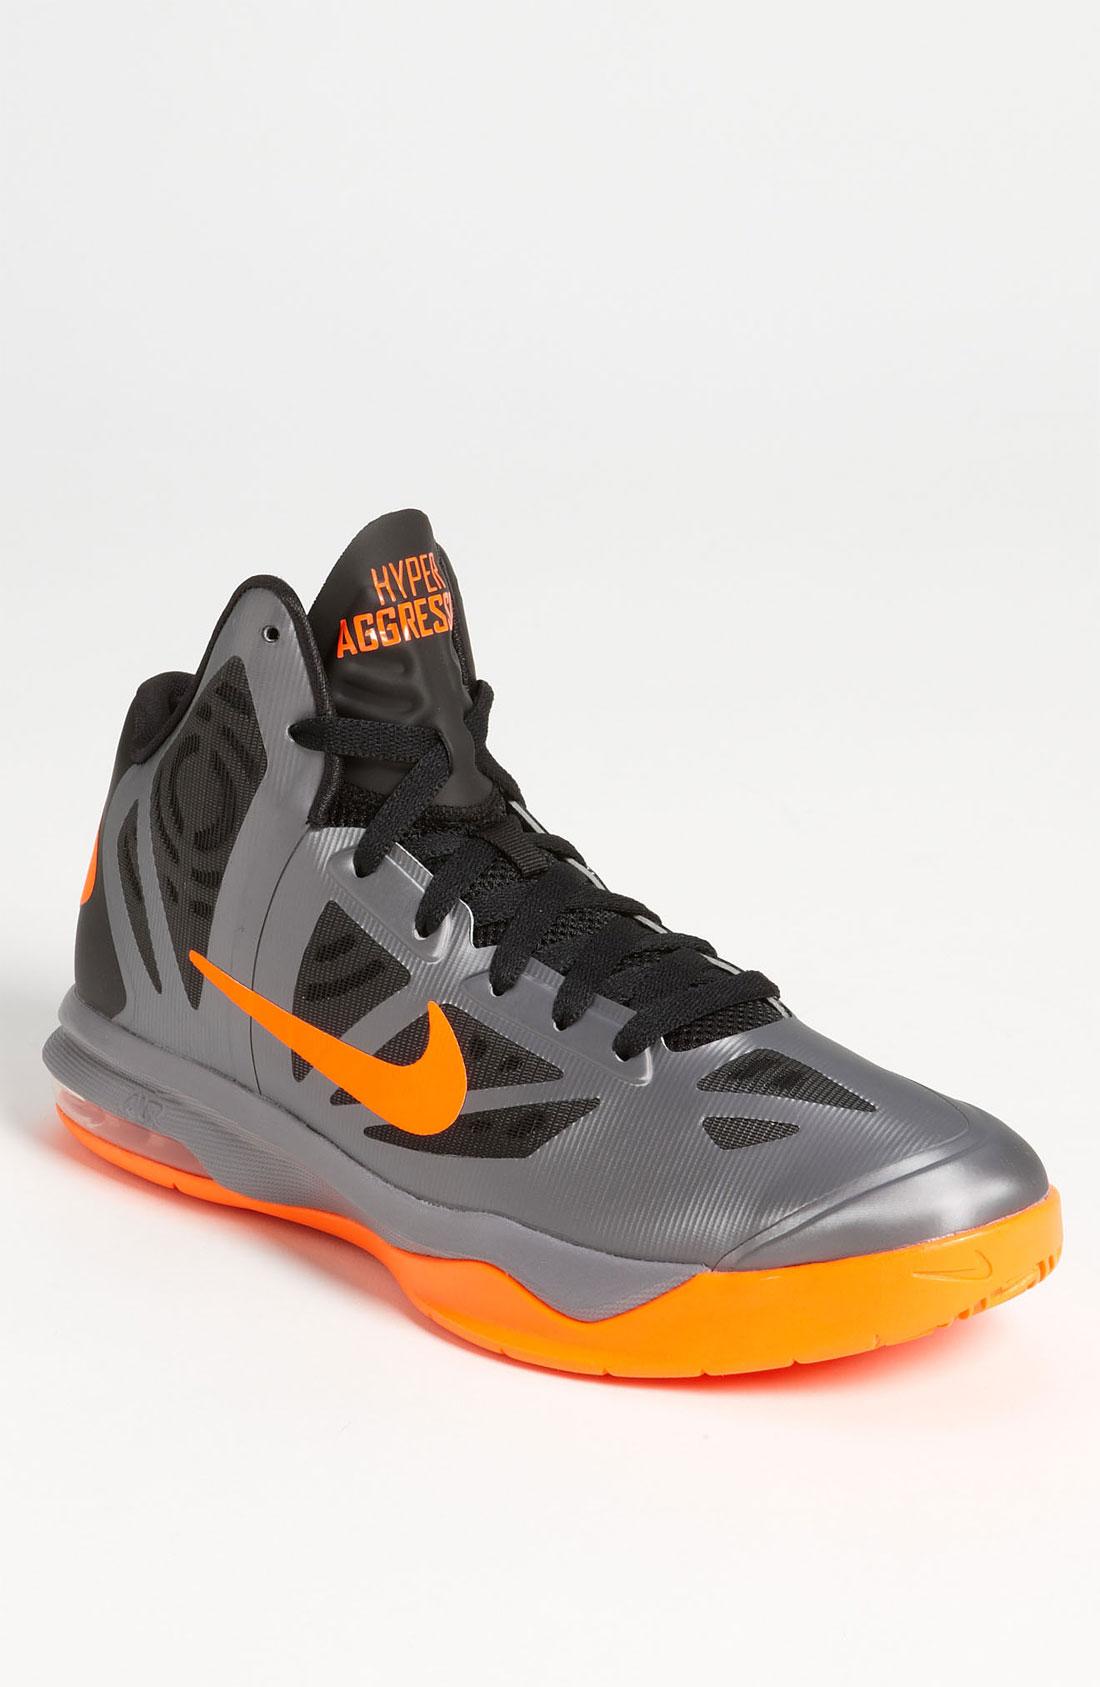 Nike Basketball Shoes 2012 Black Nike Air Max Hyperaggr...